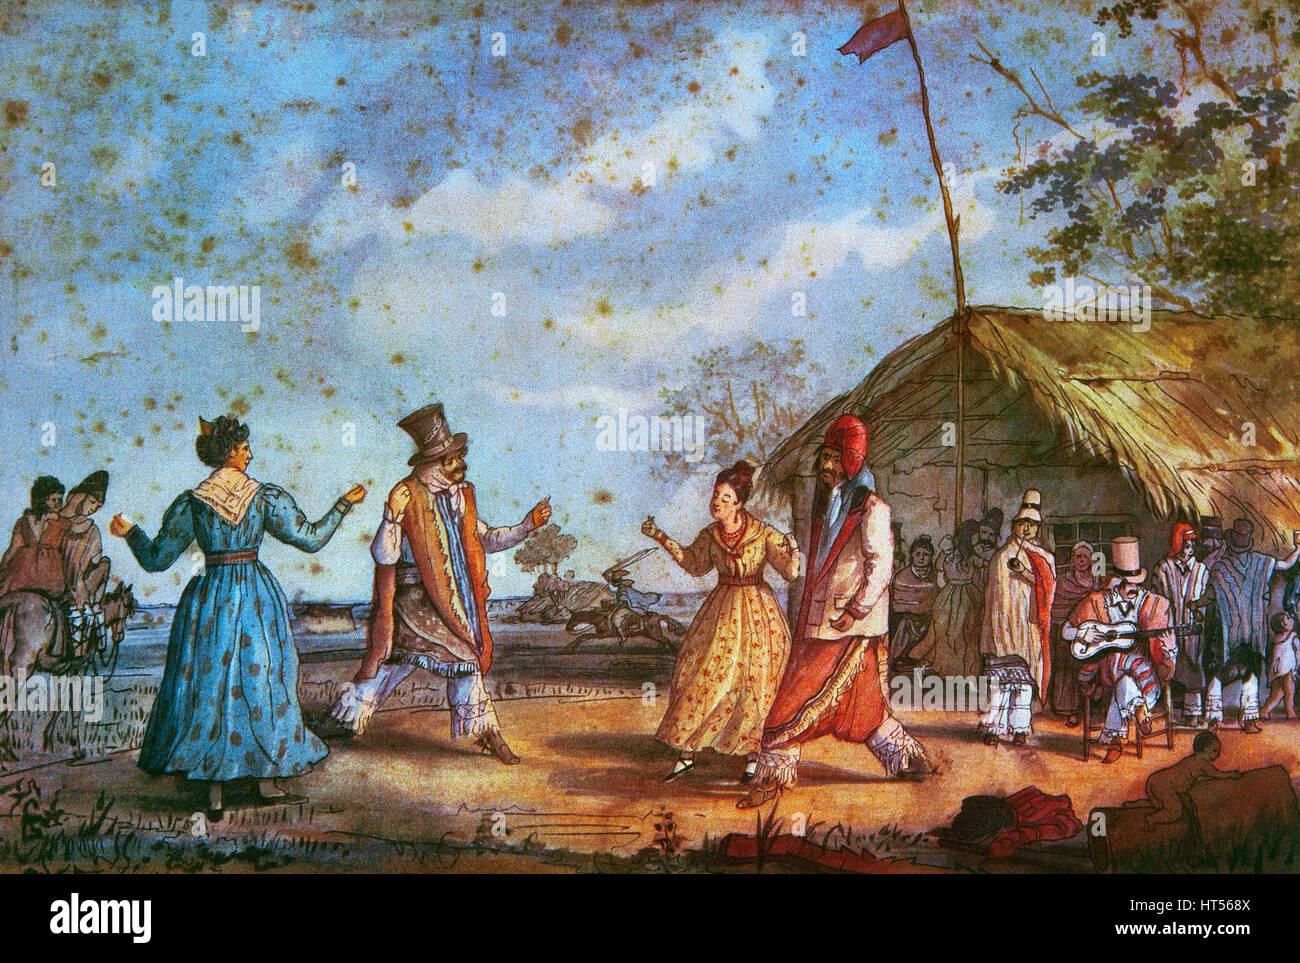 "Folklore. Argentinien. Buenos Aires. des 19. Jahrhunderts. Traditioneller Tanz ""Cielito"". Lithographie Stockbild"